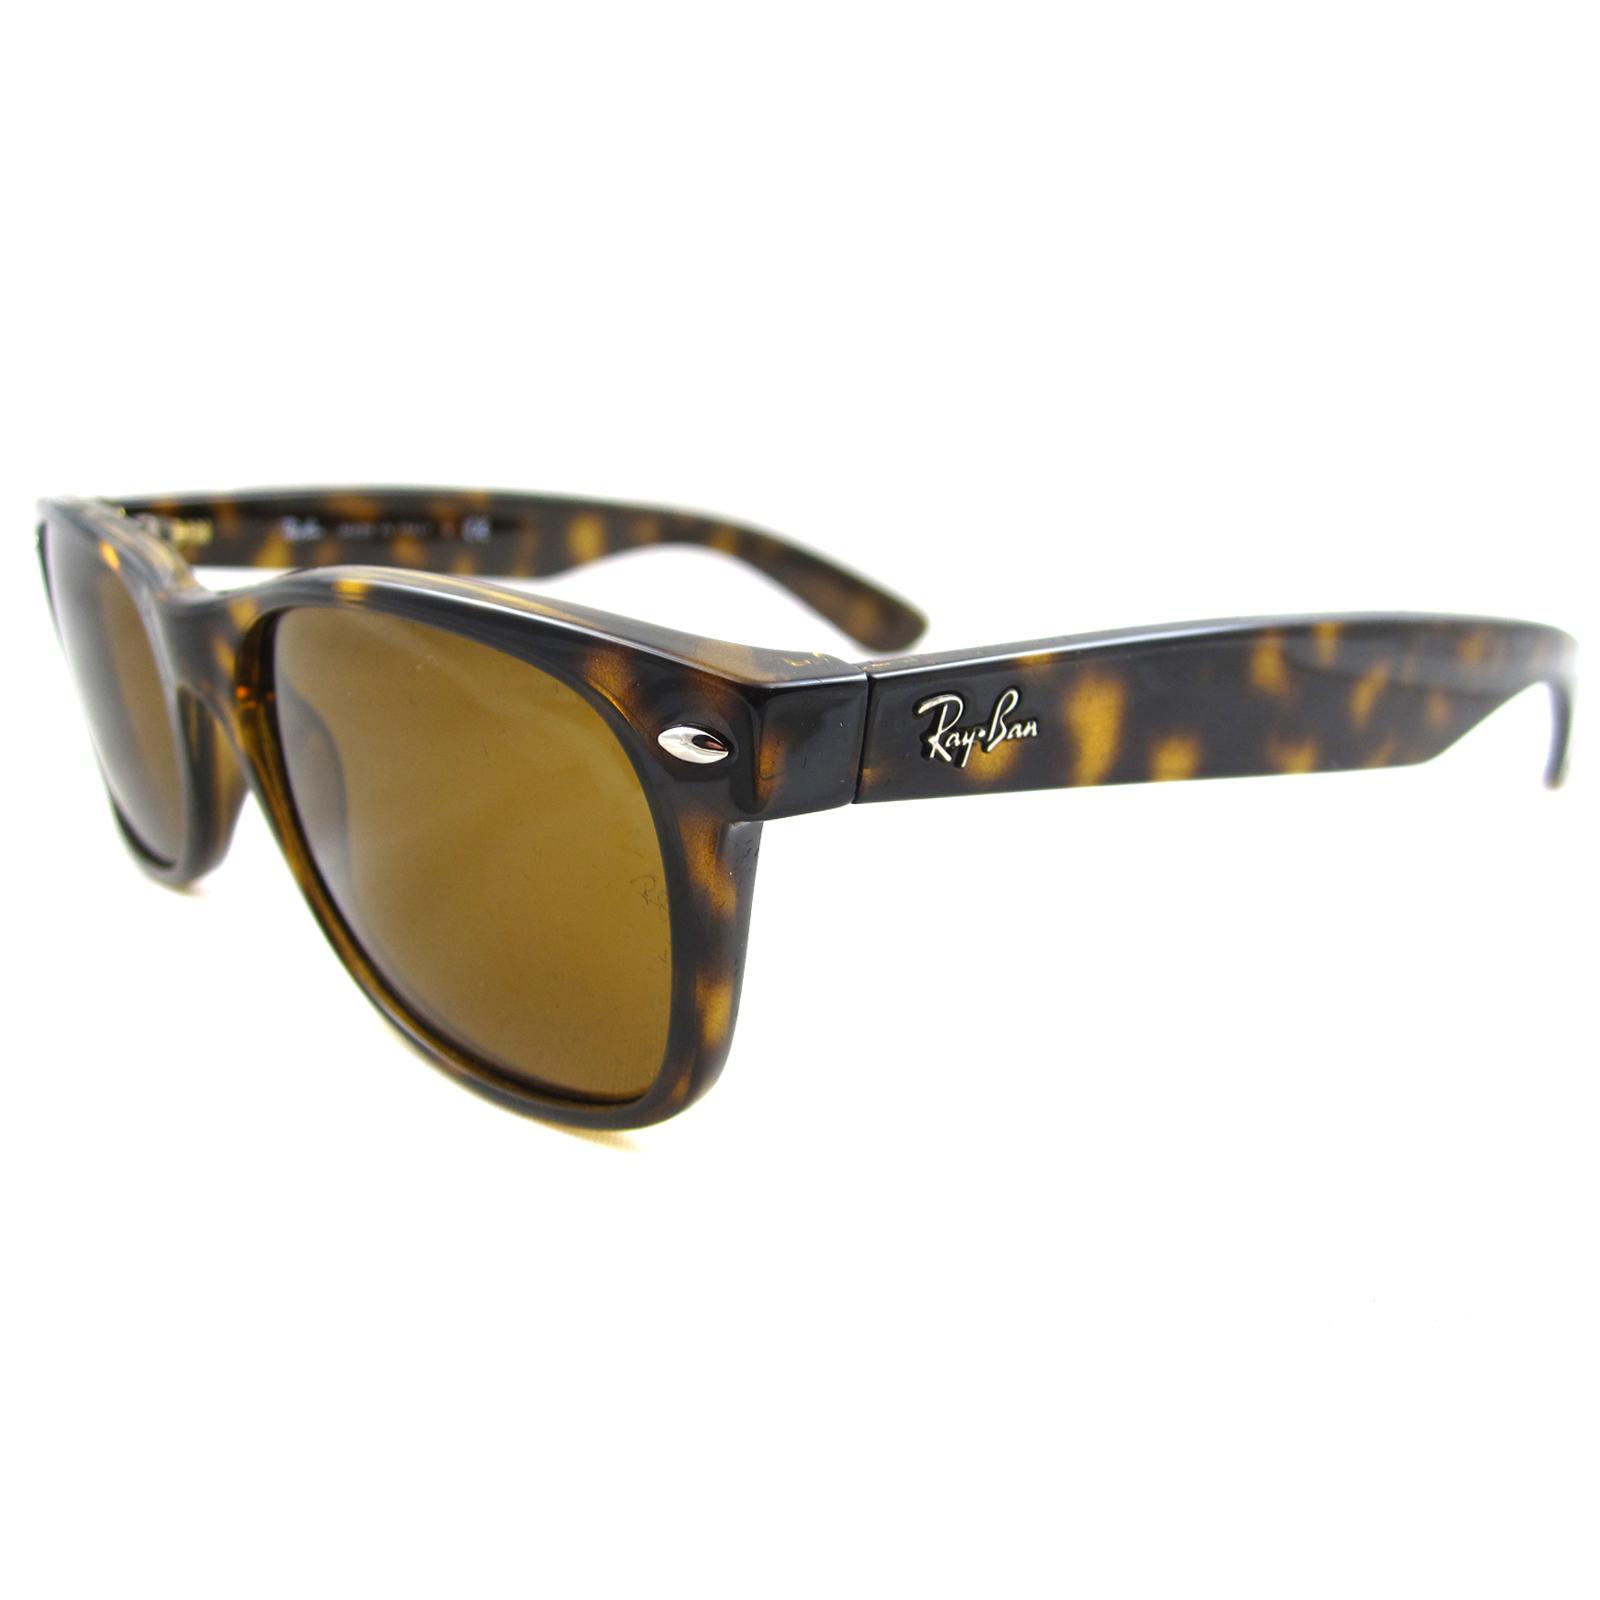 c10c999c6 Sentinel Ray-Ban Sunglasses New Wayfarer 2132 710 Light Havana Brown Medium  55mm